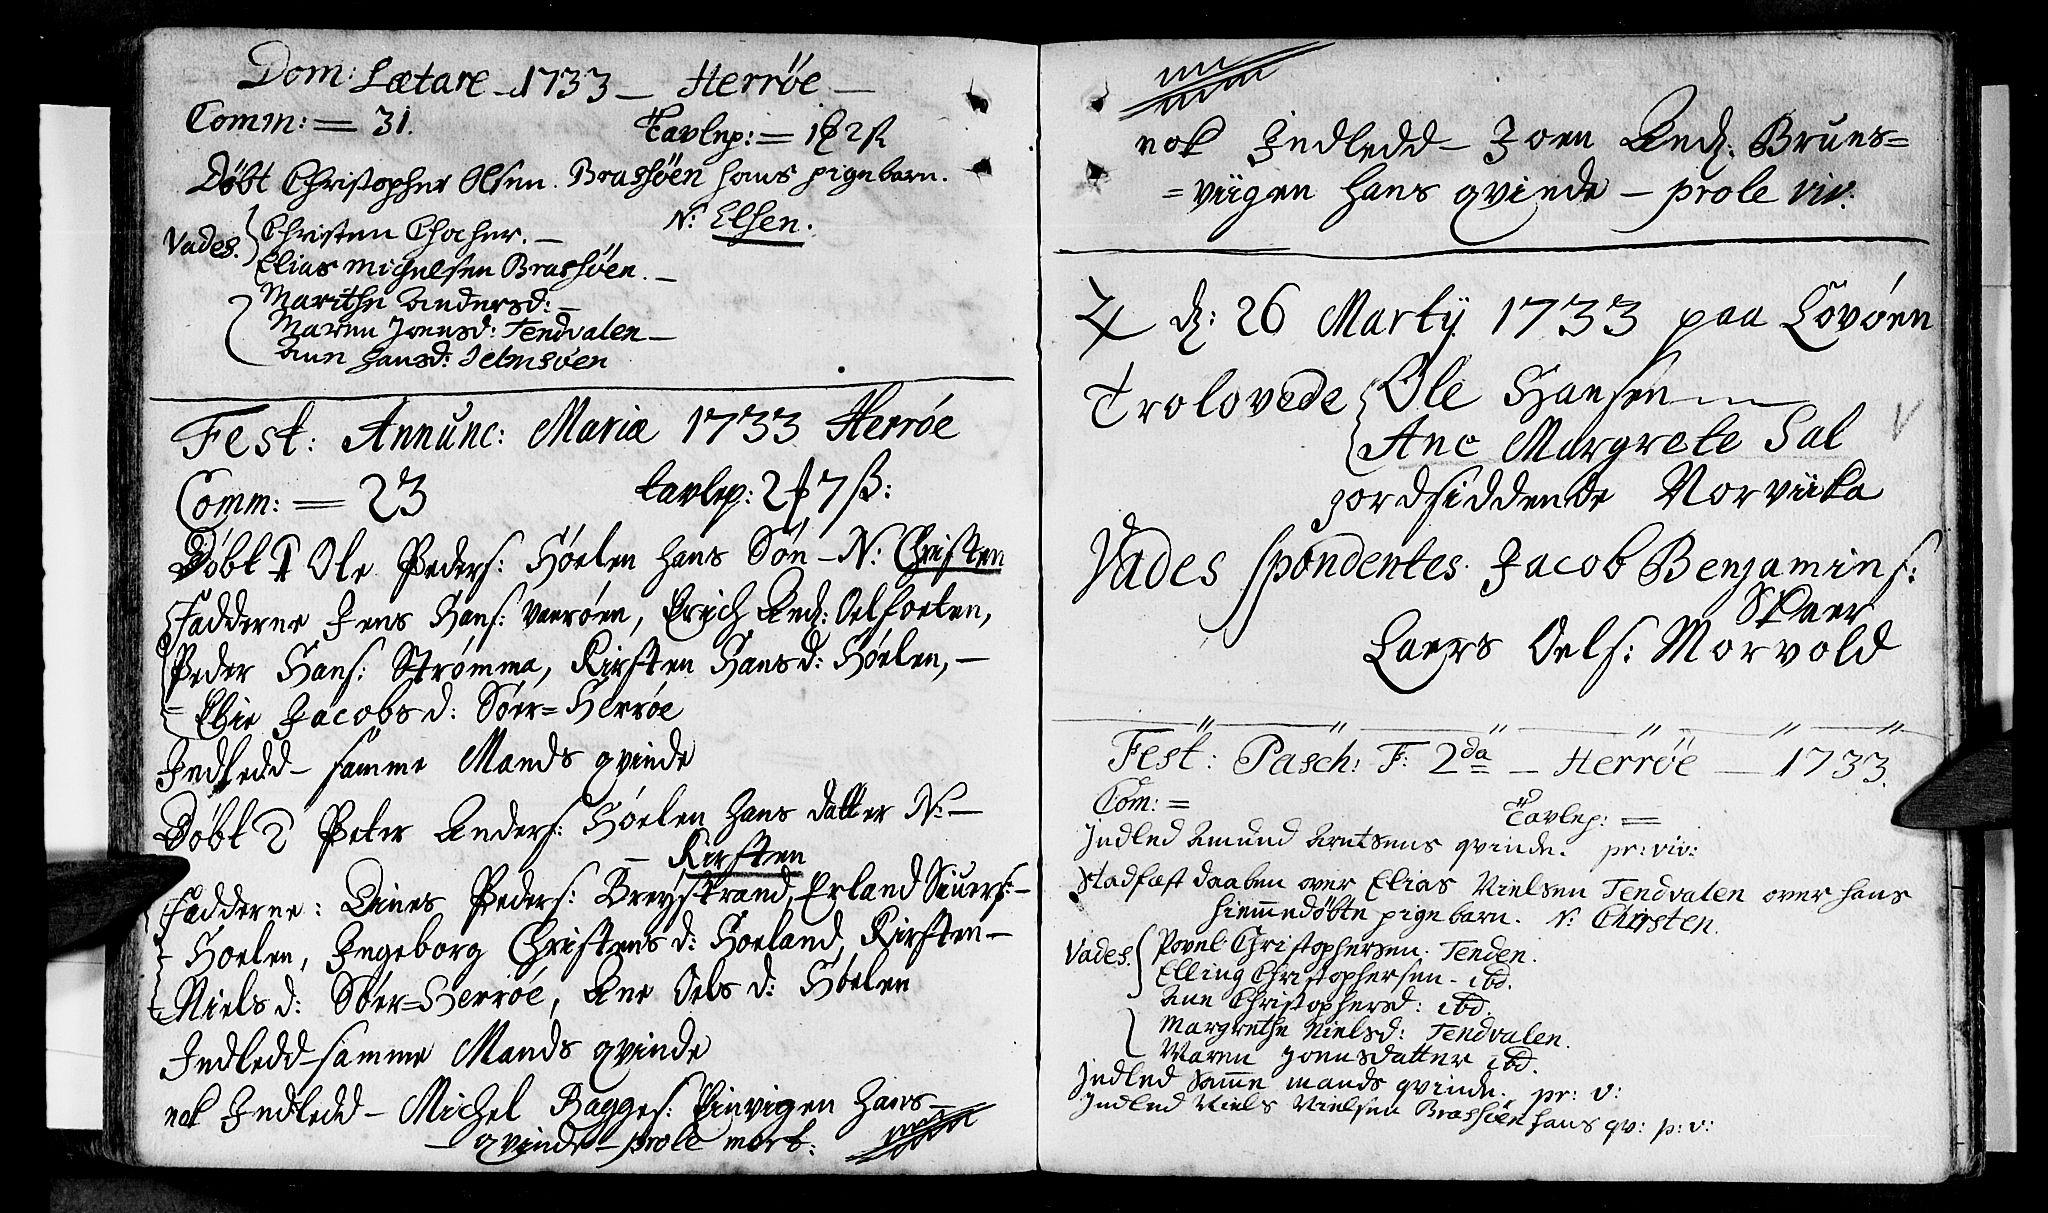 SAT, Ministerialprotokoller, klokkerbøker og fødselsregistre - Nordland, 834/L0503: Ministerialbok nr. 834A01, 1714-1737